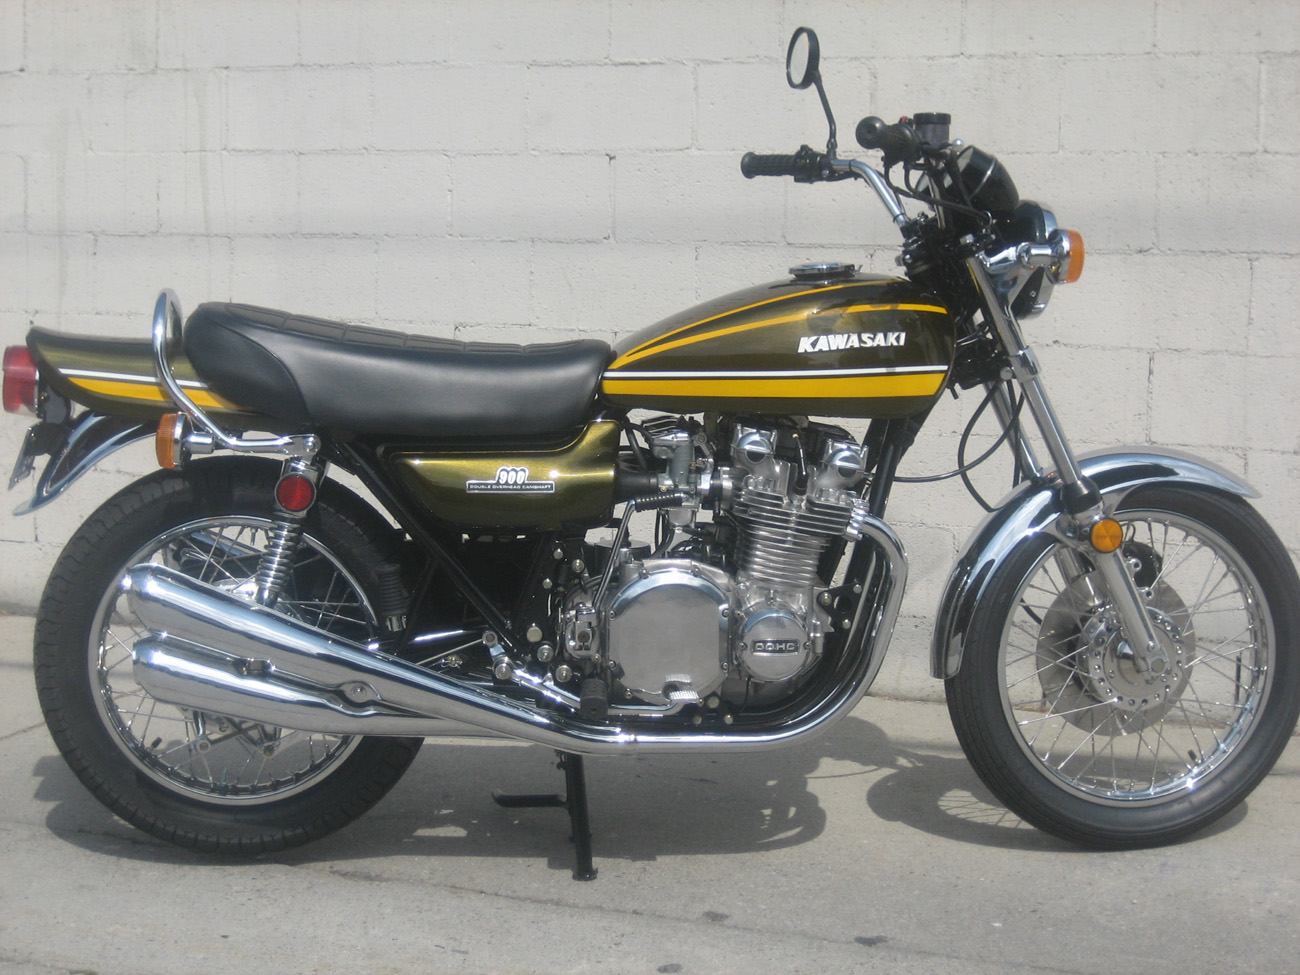 http://garagecompany.com/bikes/japanese/74_Z1900/IMG_5402.JPG